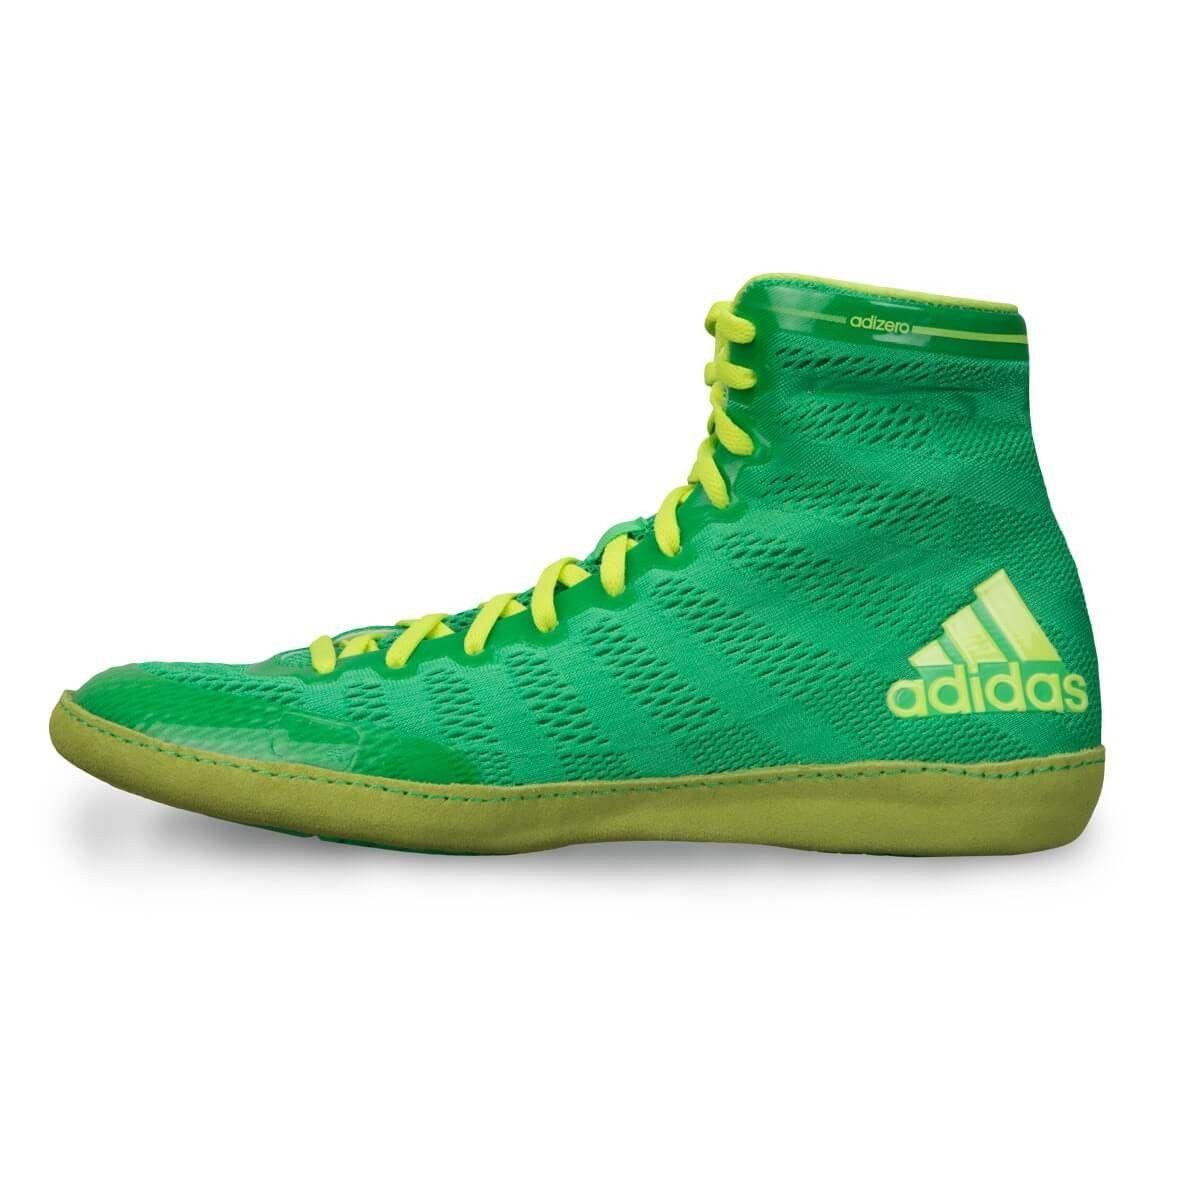 Adidas Adizero Varner Boxing Shoes | Boxing shoes, Wrestling shoes ...